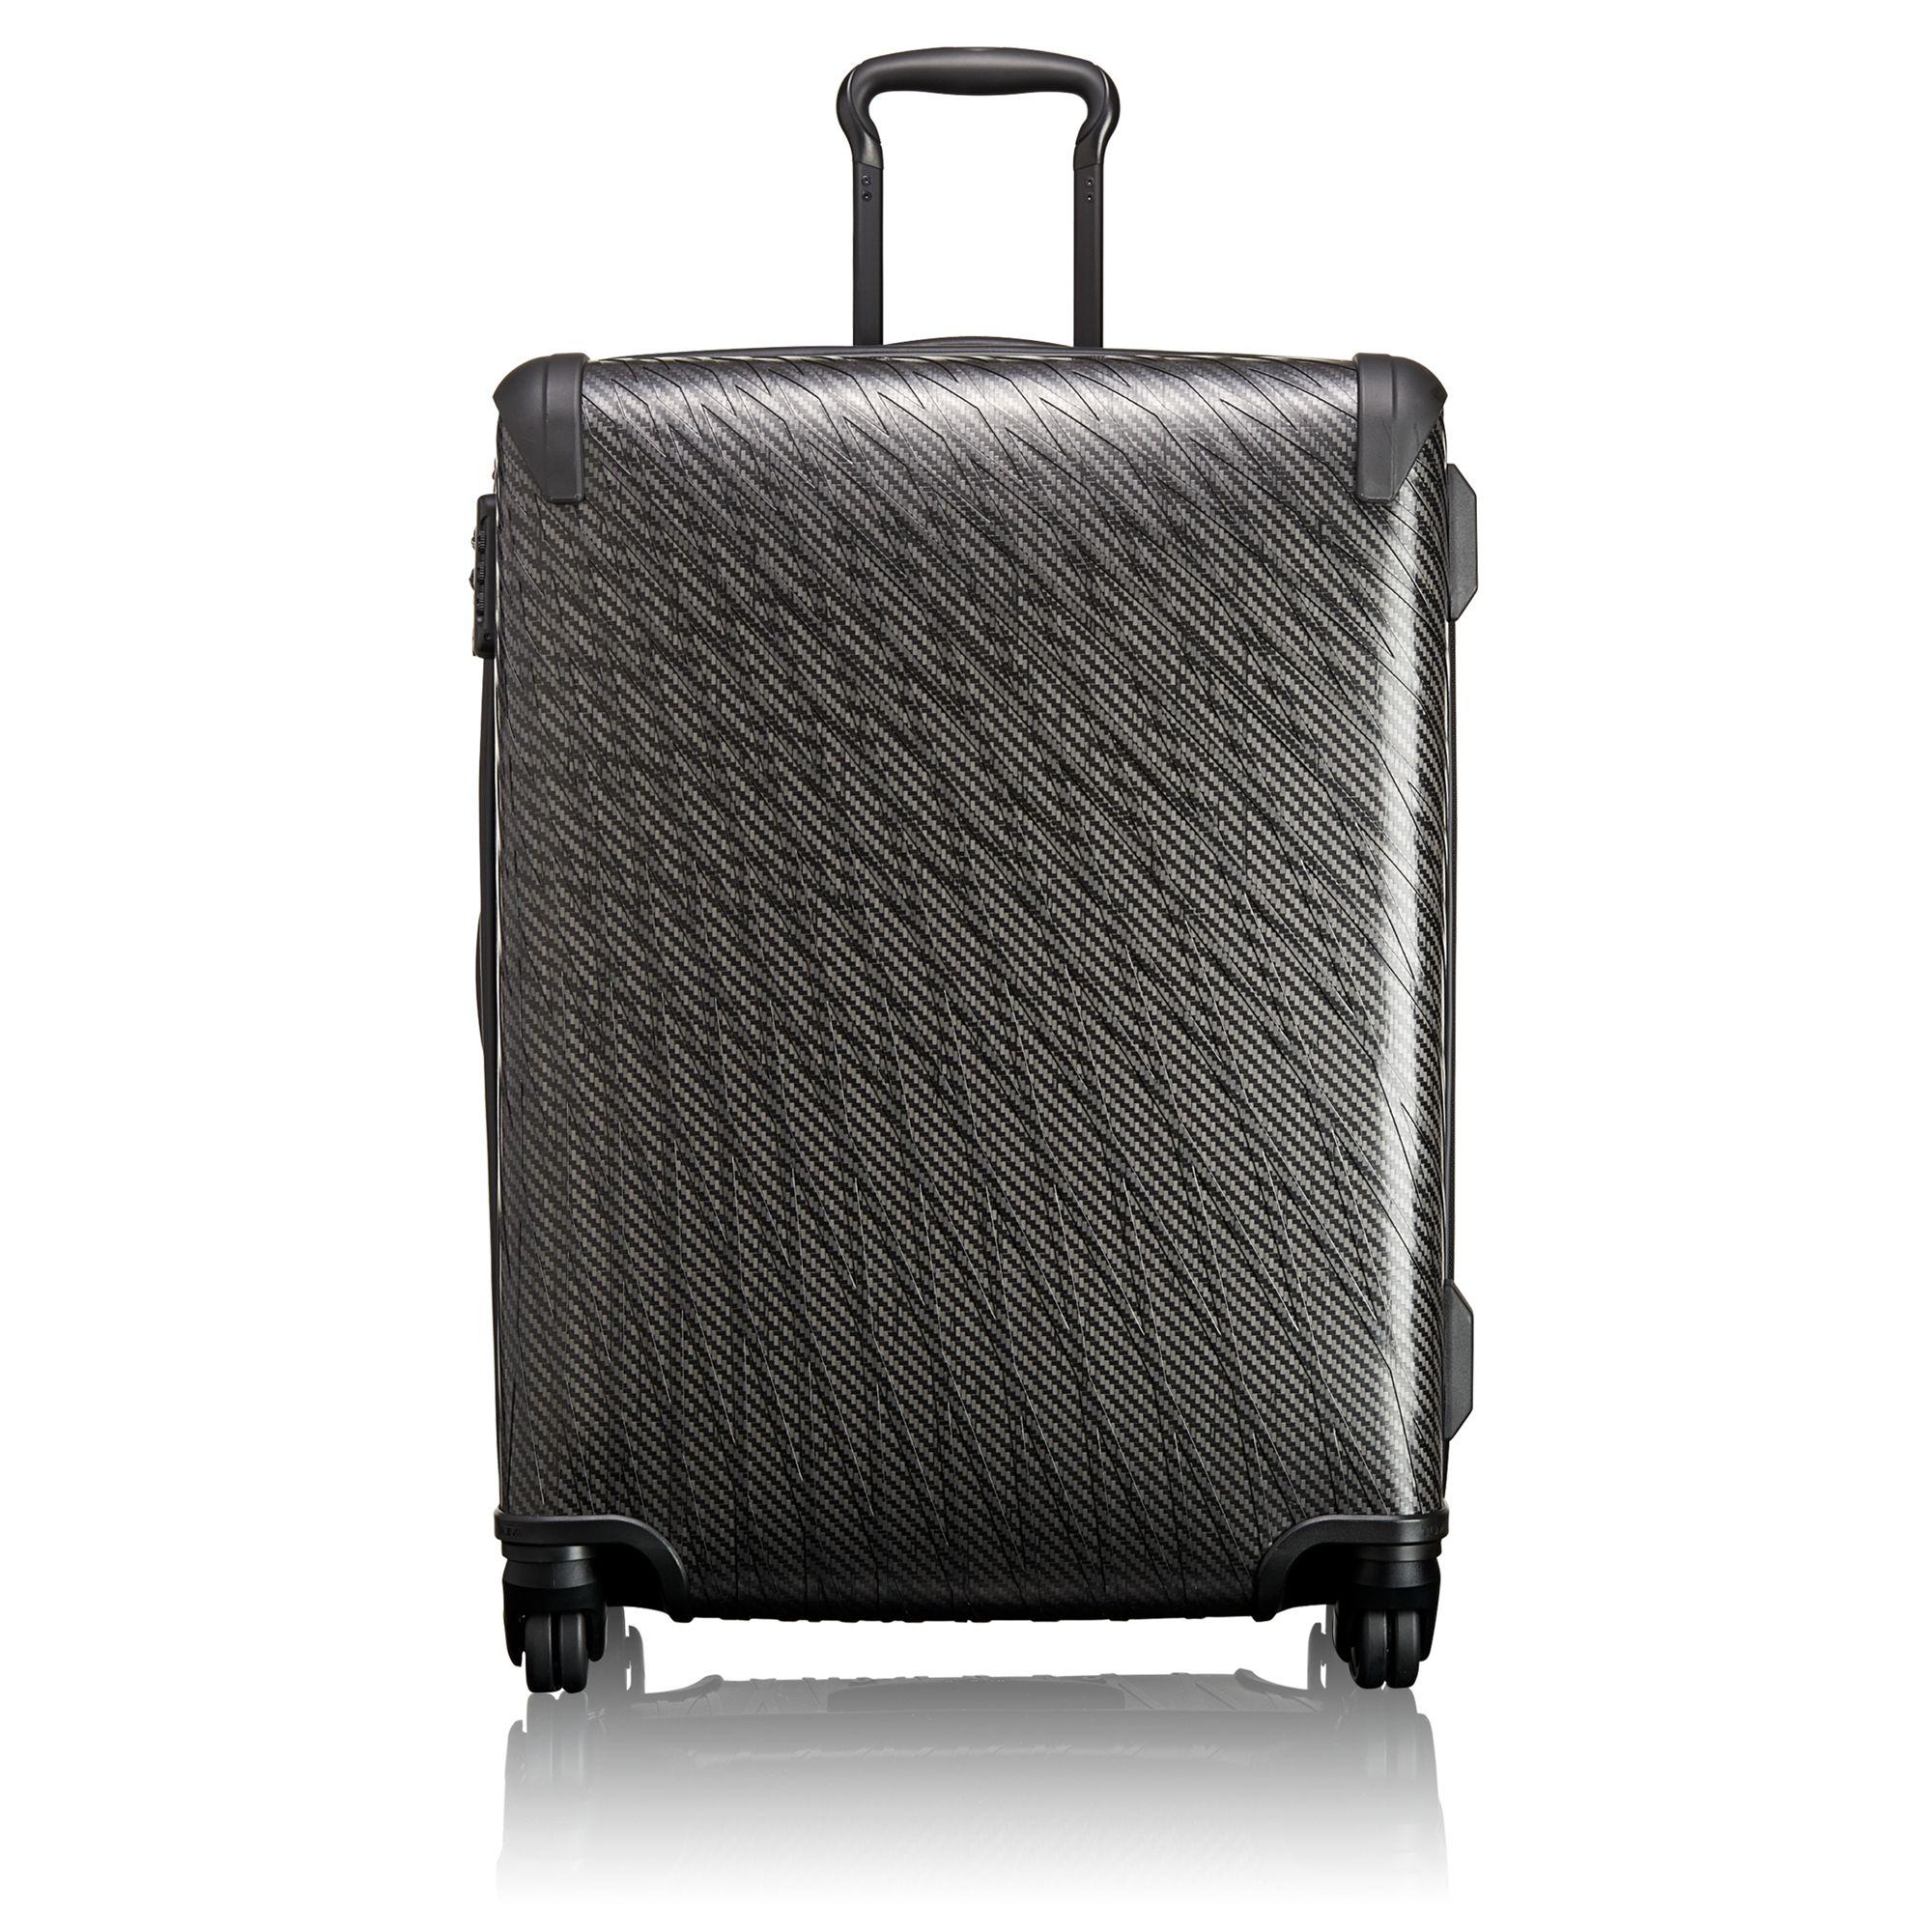 Tumi-Public-School-suitcase-1.jpeg